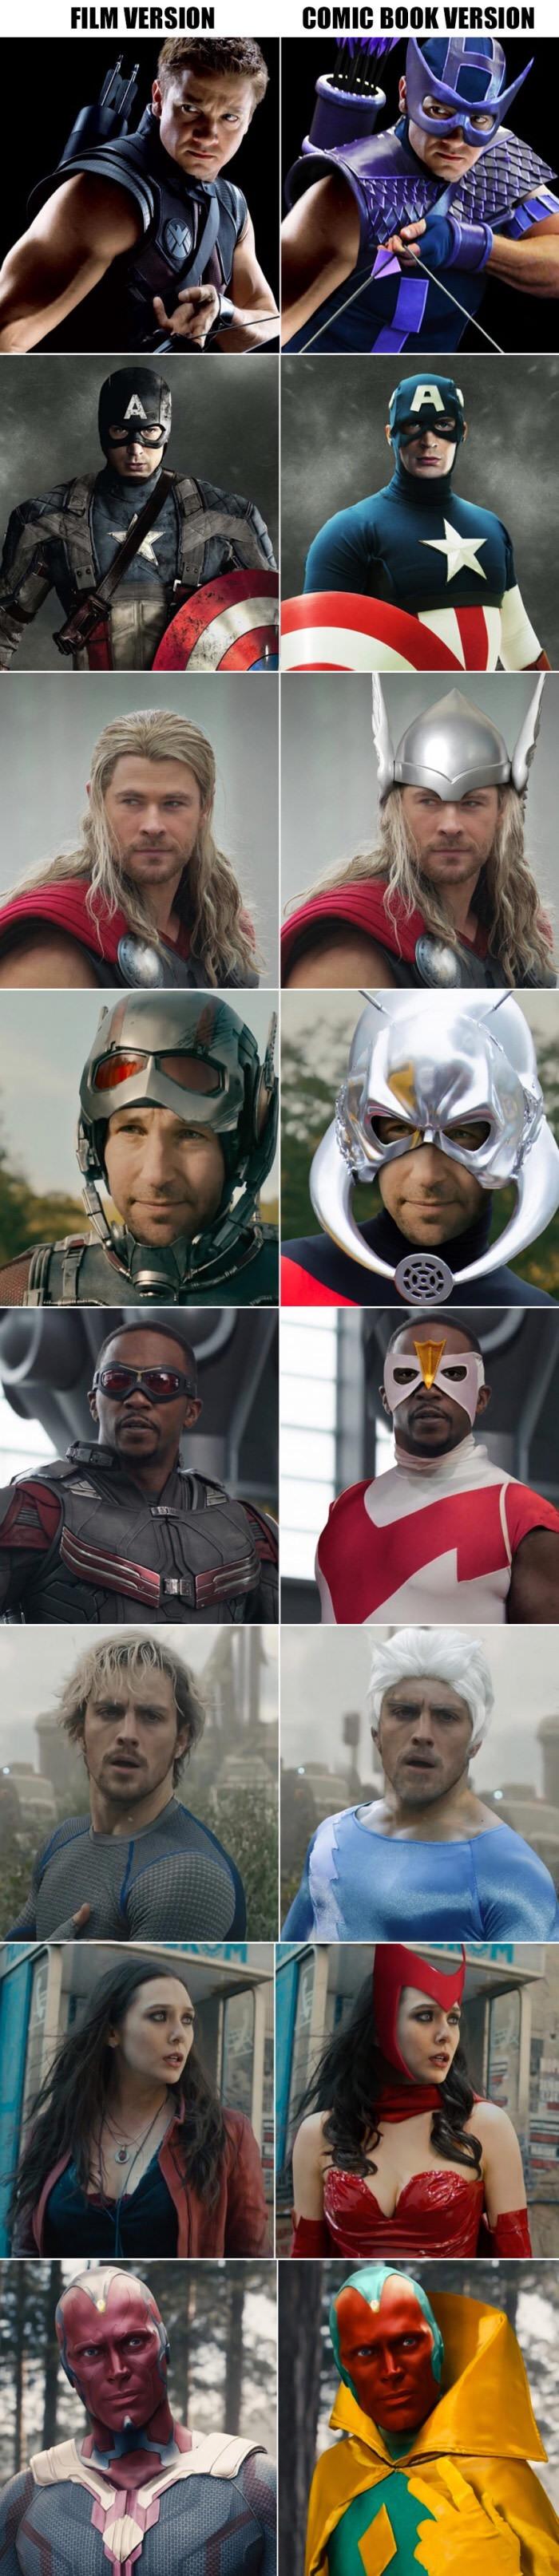 Marvel comic movies vs comic books.jpeg